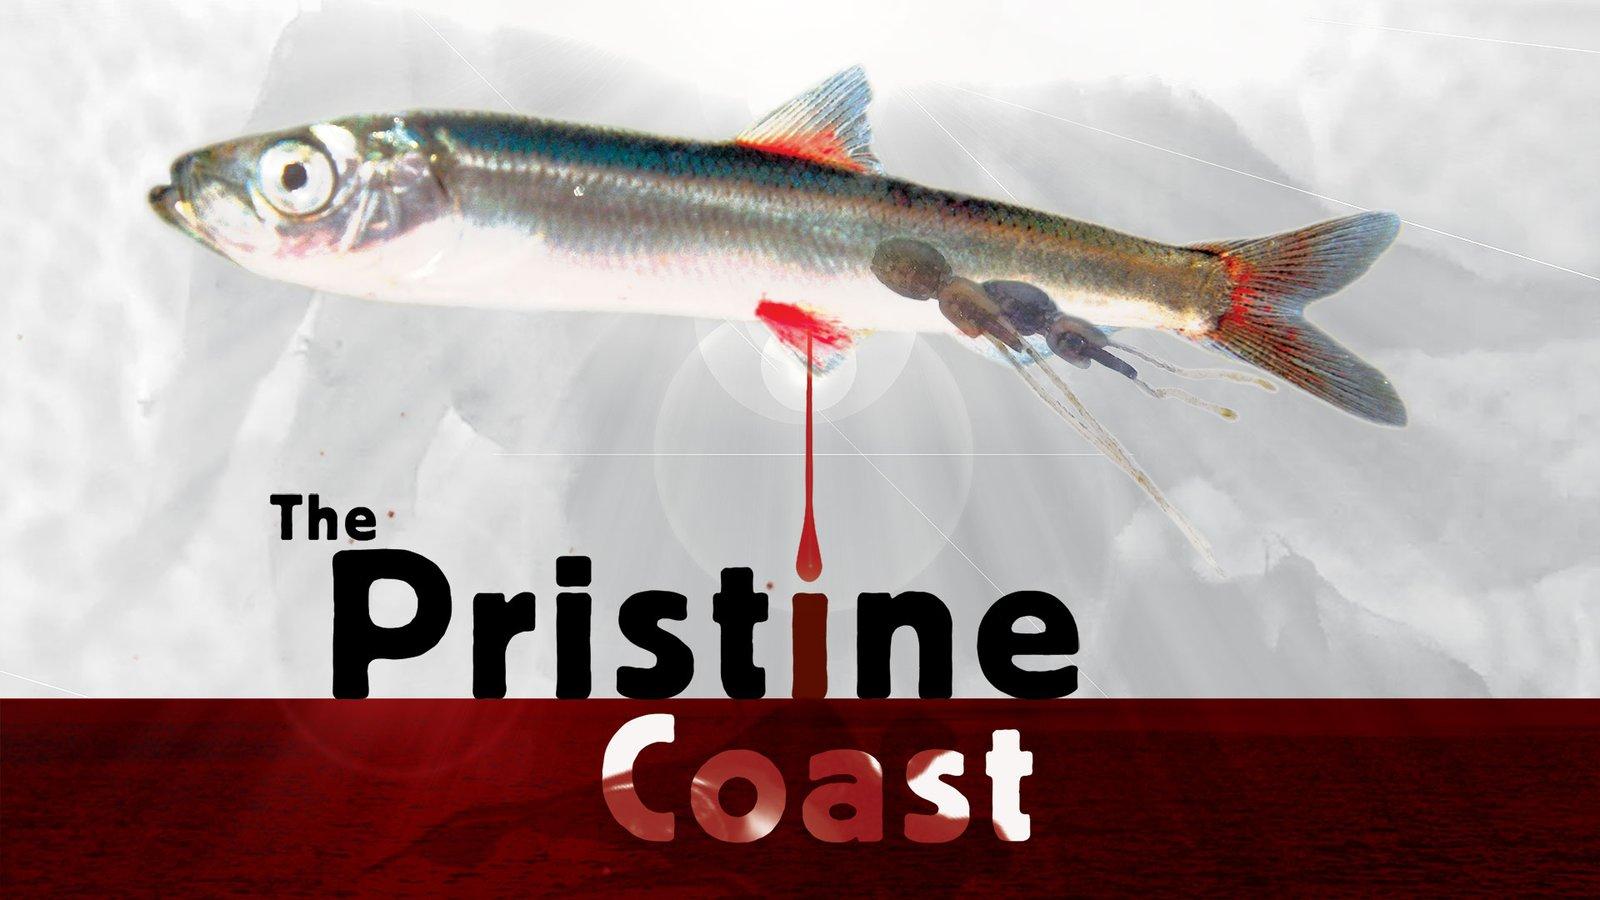 The Pristine Coast - Investigating British Columbia's Marine Ecosystem